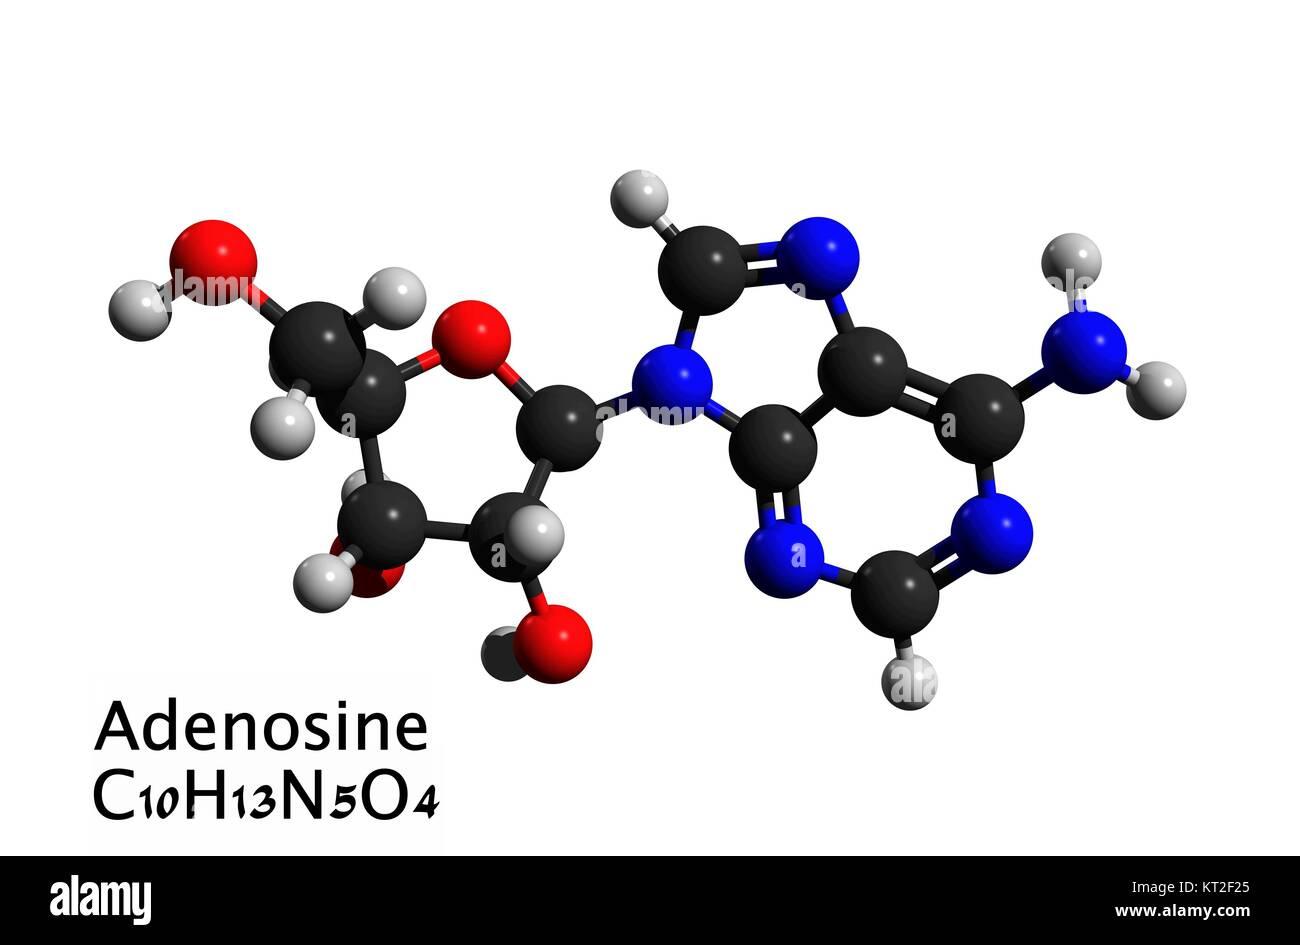 Molecular structure of adenosine (a purine nucleoside), neuromodulator, medication, 3D rendering - Stock Image